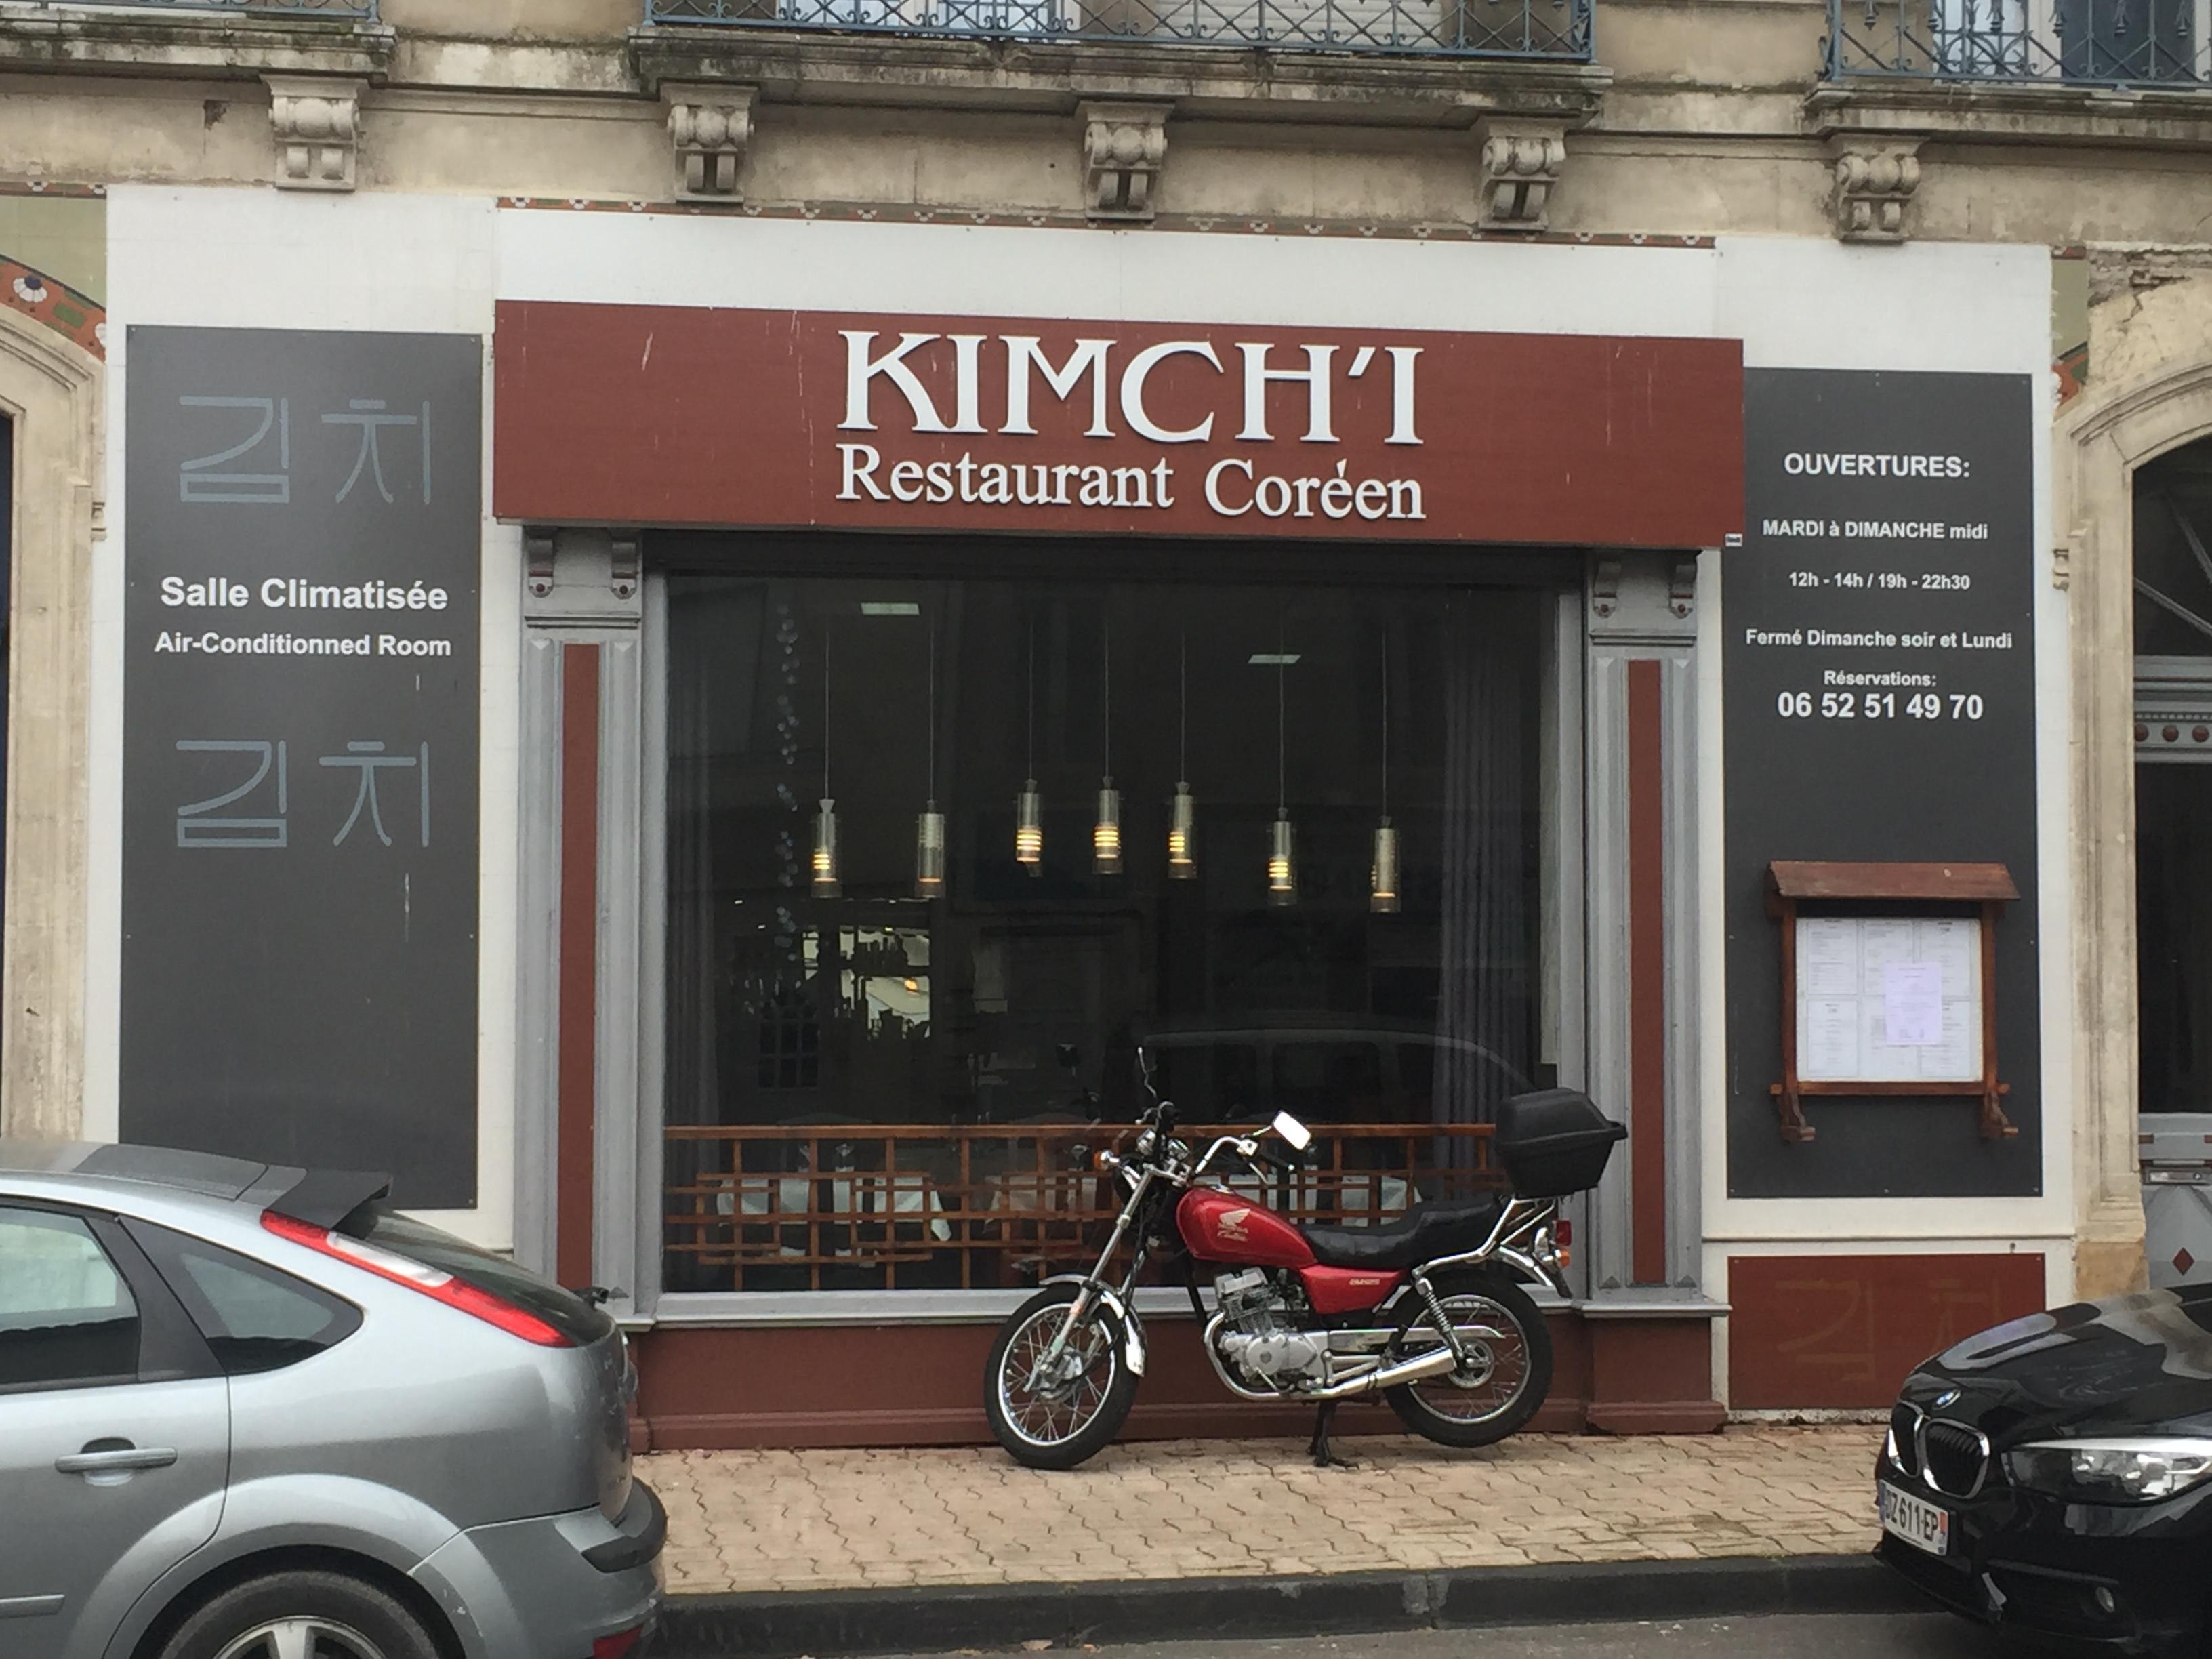 KIMCH'I